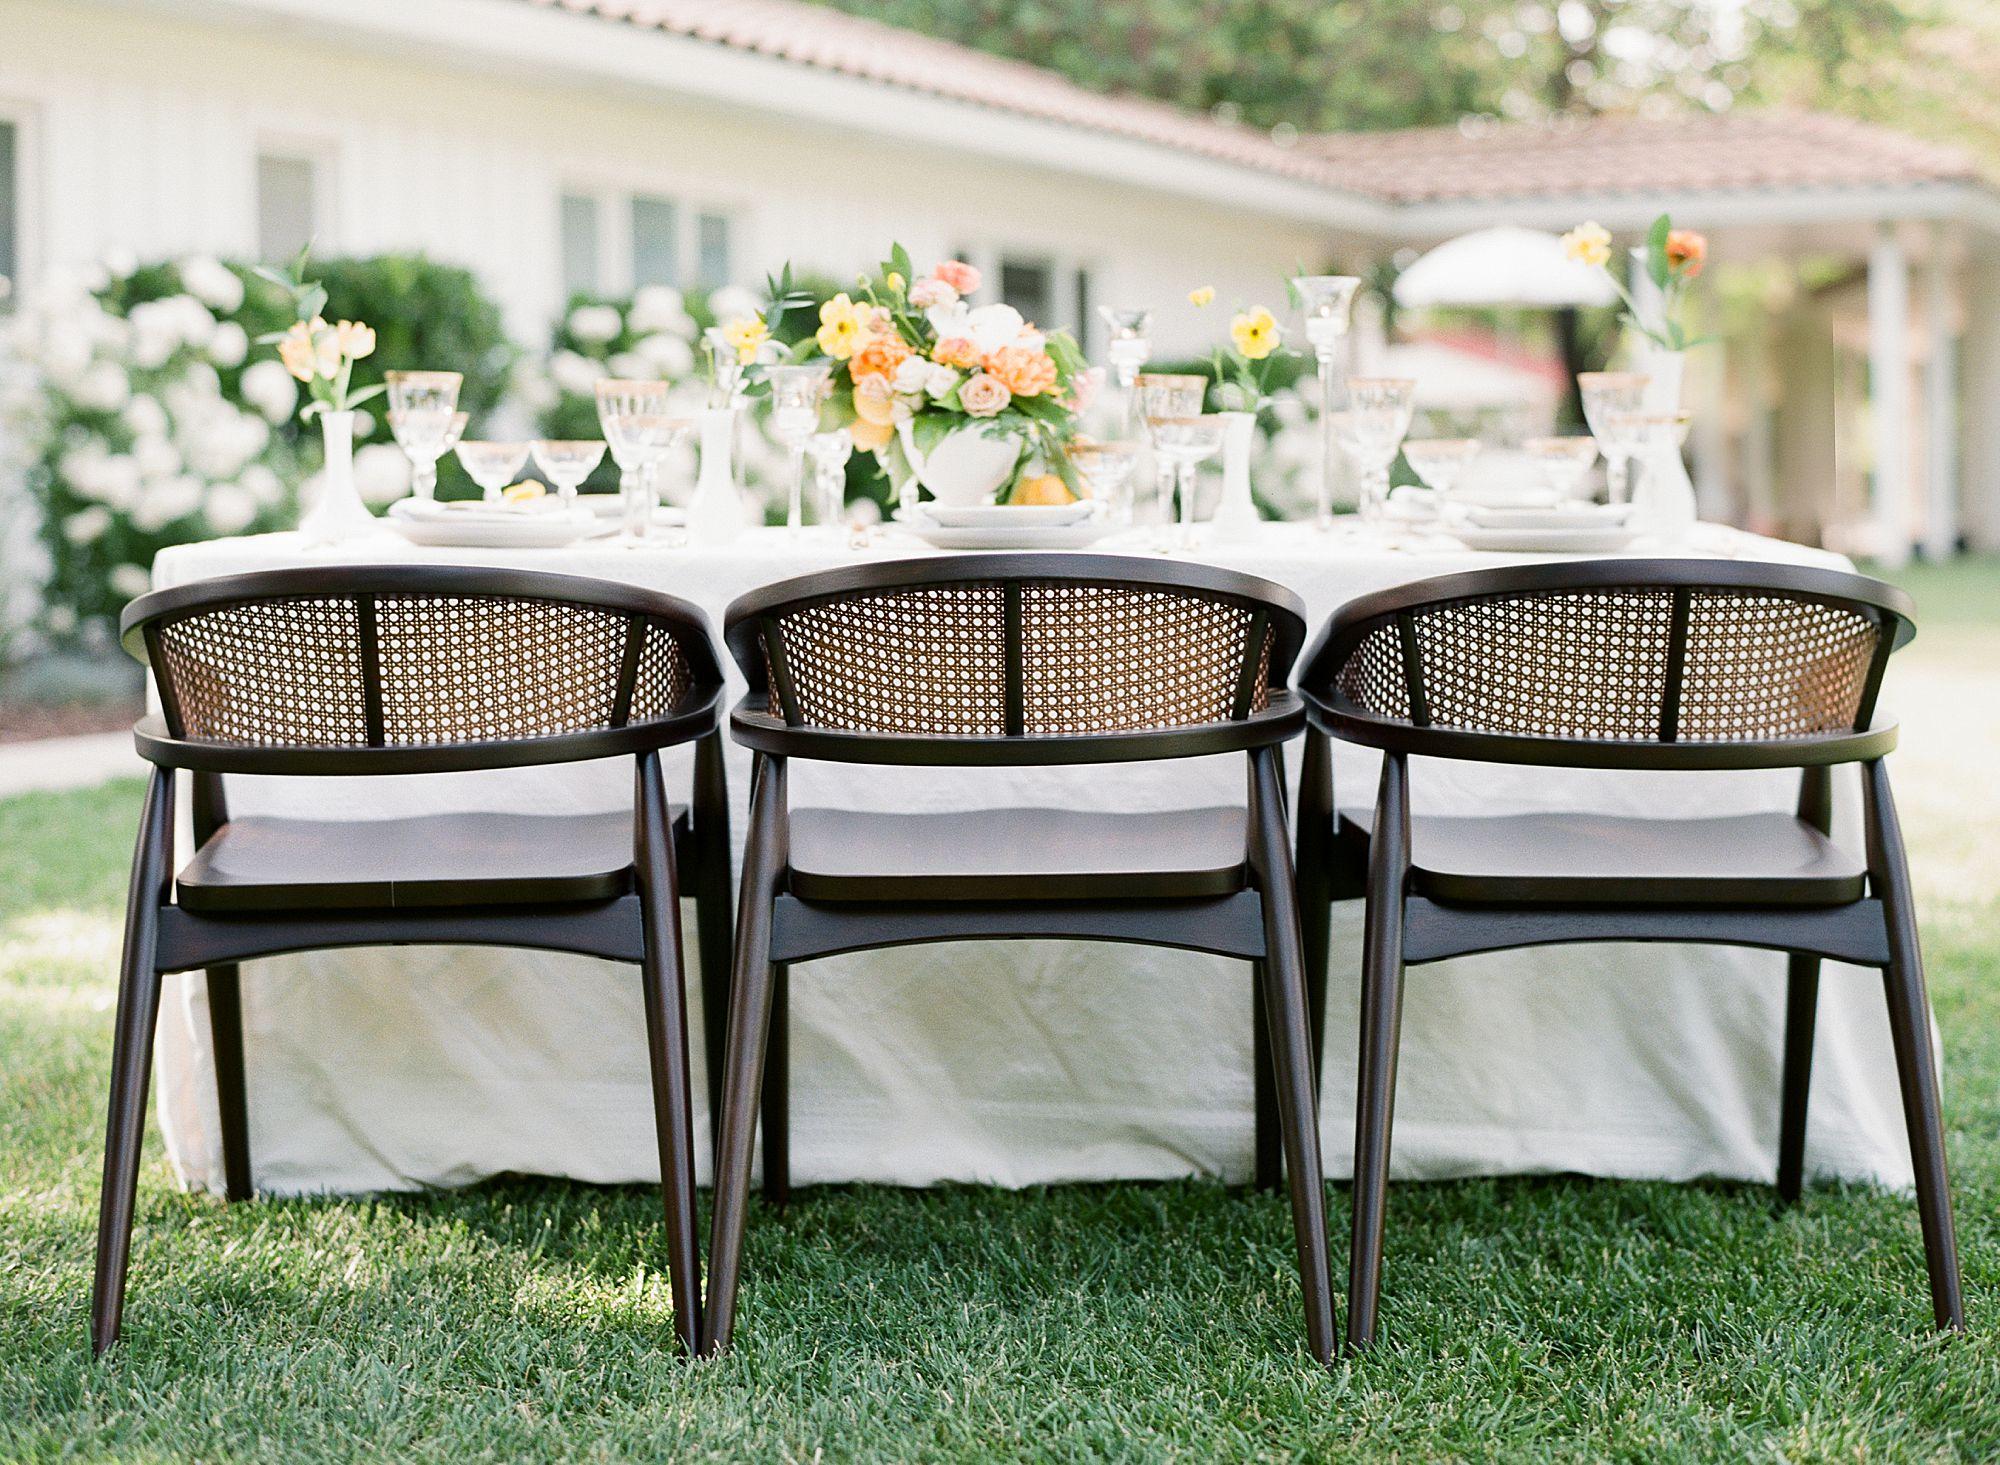 Italian Wedding Inspiration at The Maples Wedding & Event Center - Featured on Wedding Chicks - Ashley Baumgartner - Sacramento Wedding Phtoographer_0033.jpg